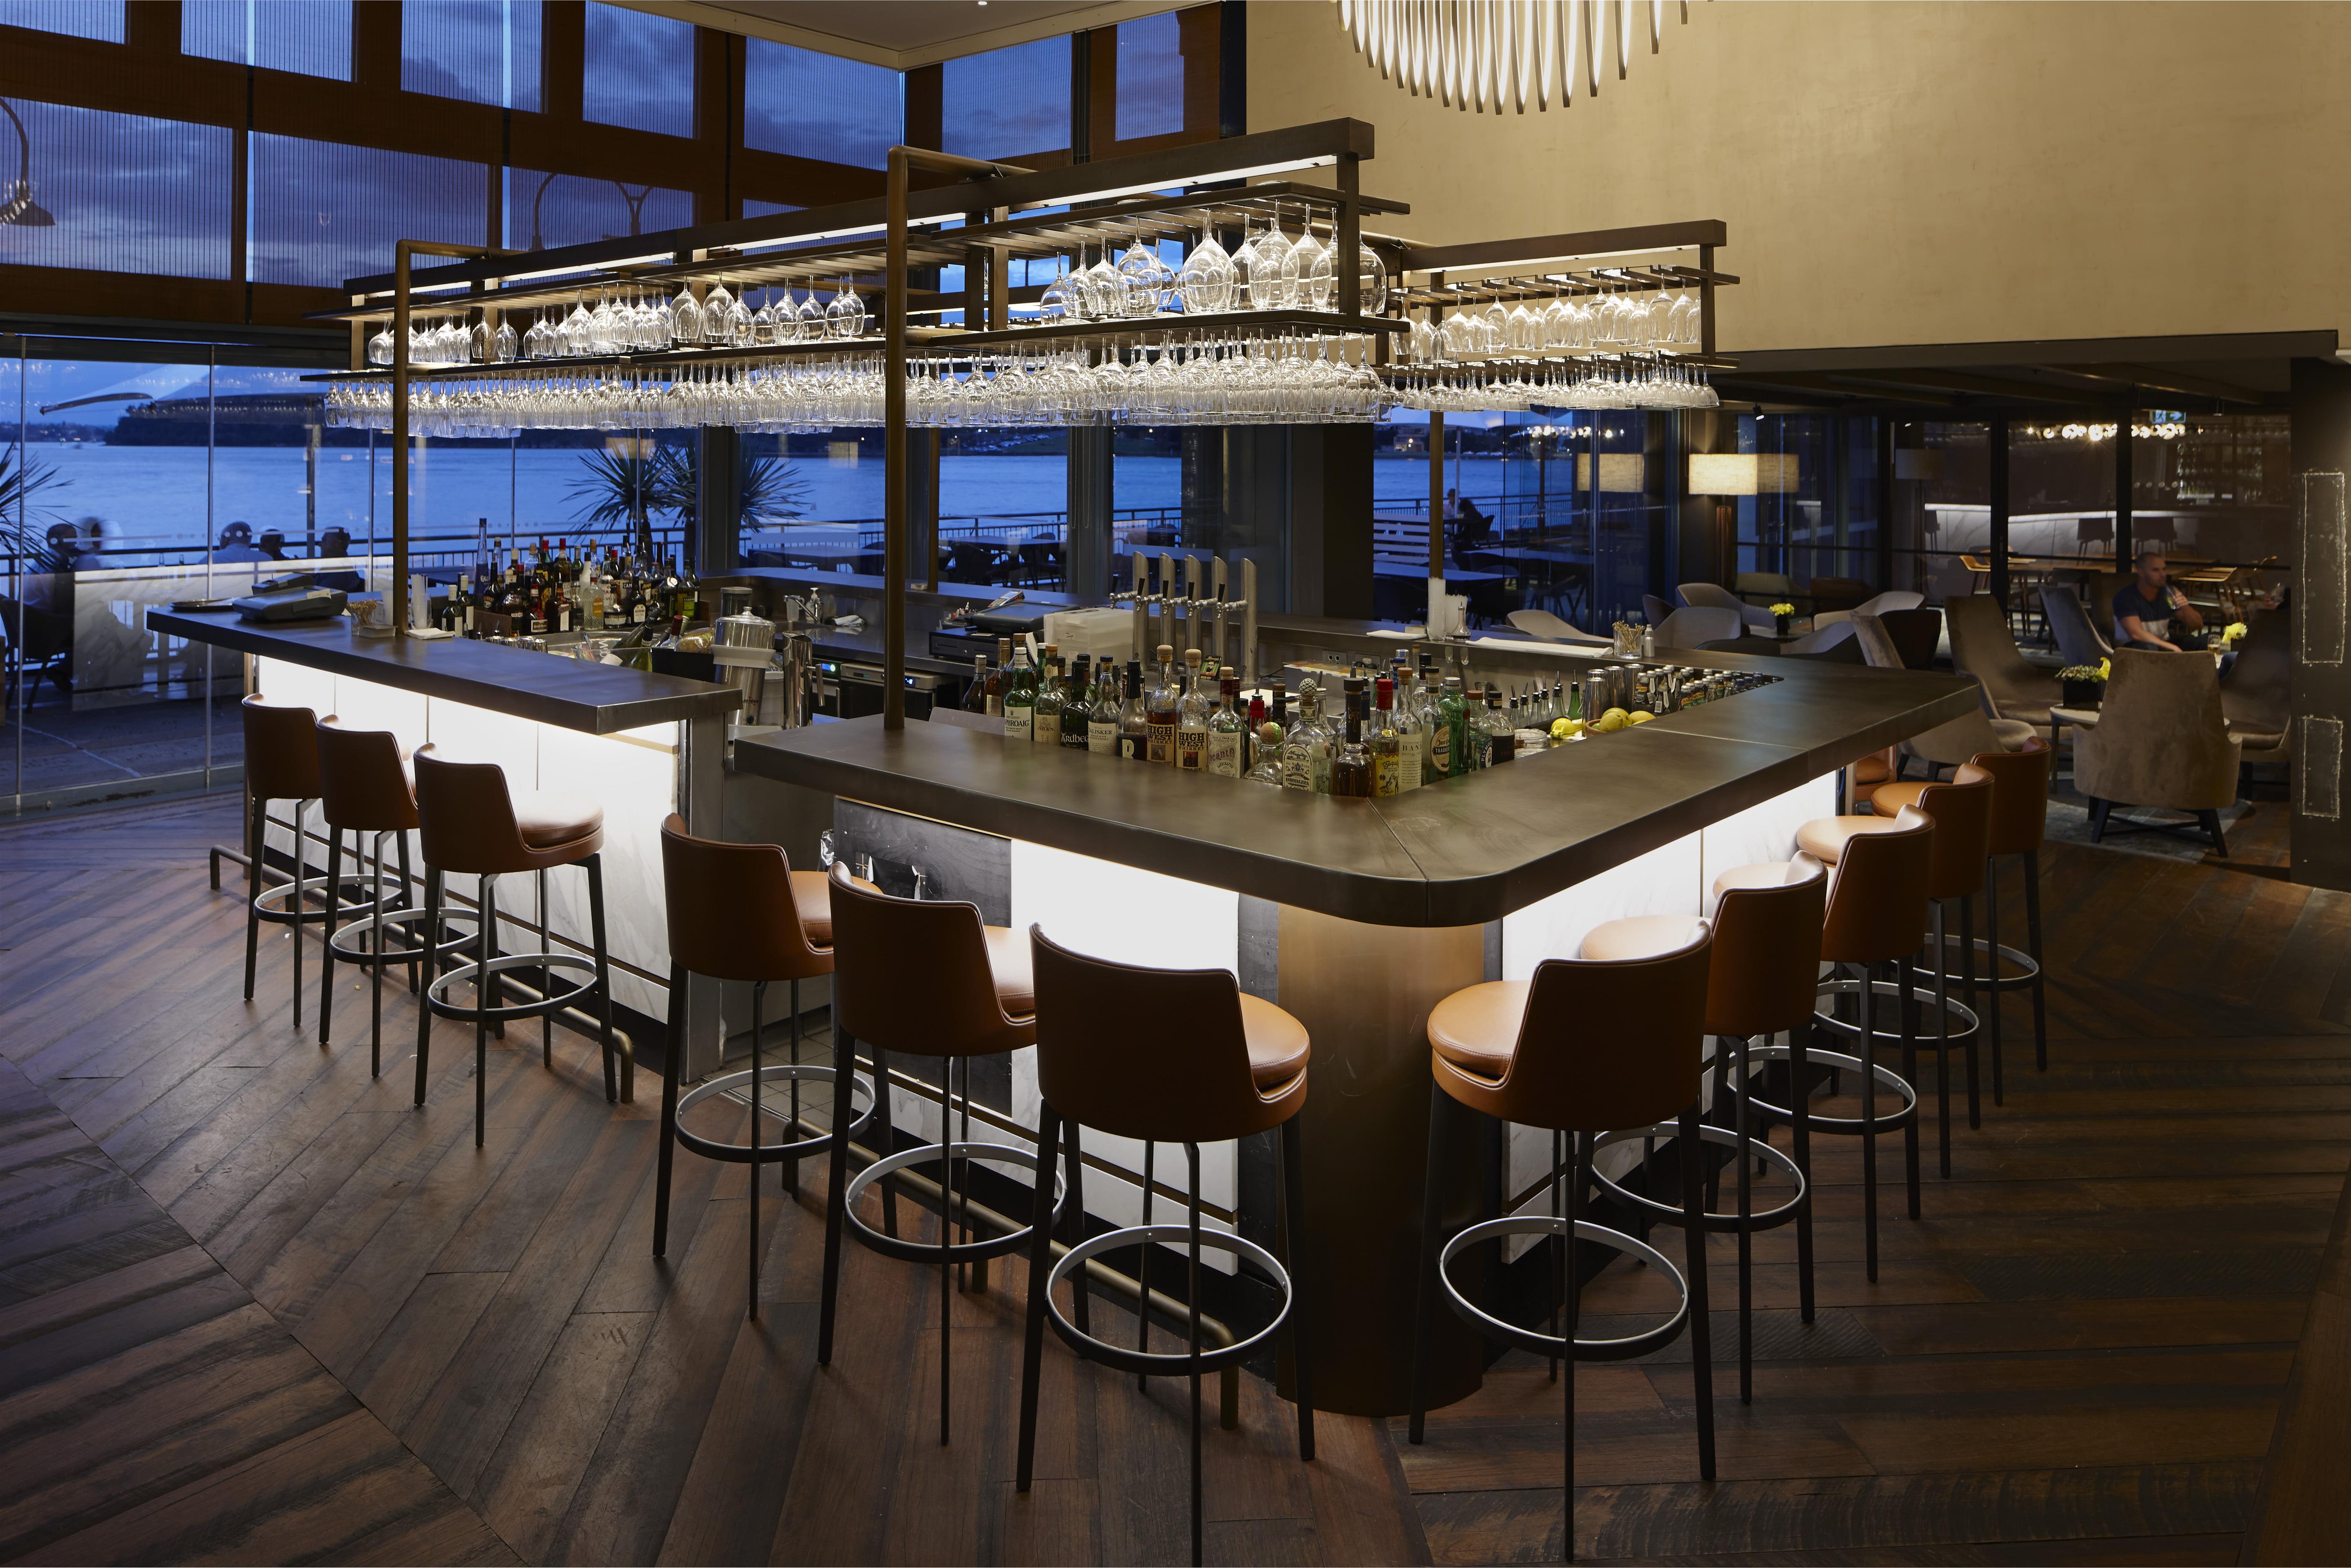 The Gantry Restaurant Amp Bar Eat Drink Play